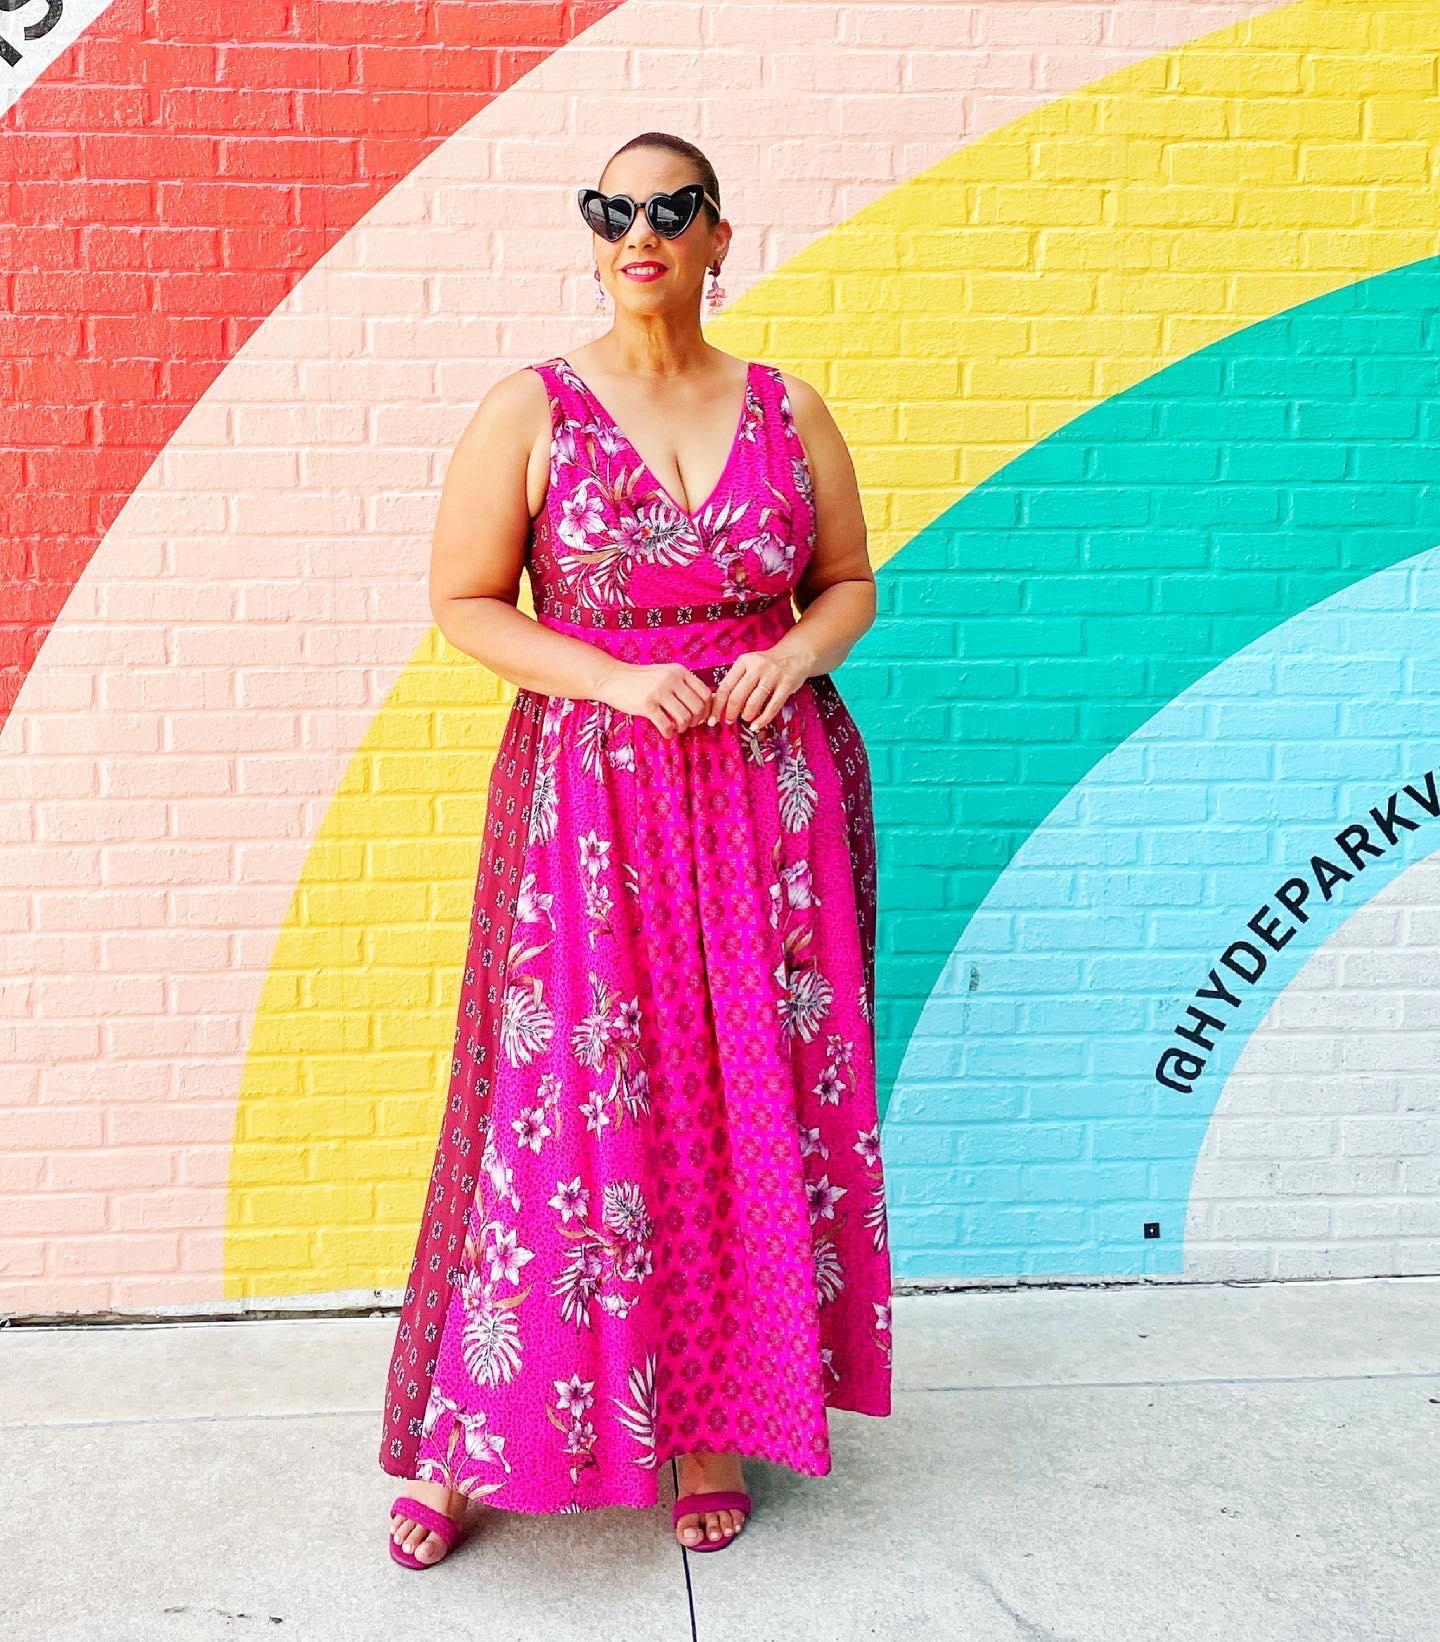 WHBM American women's clothing retailer